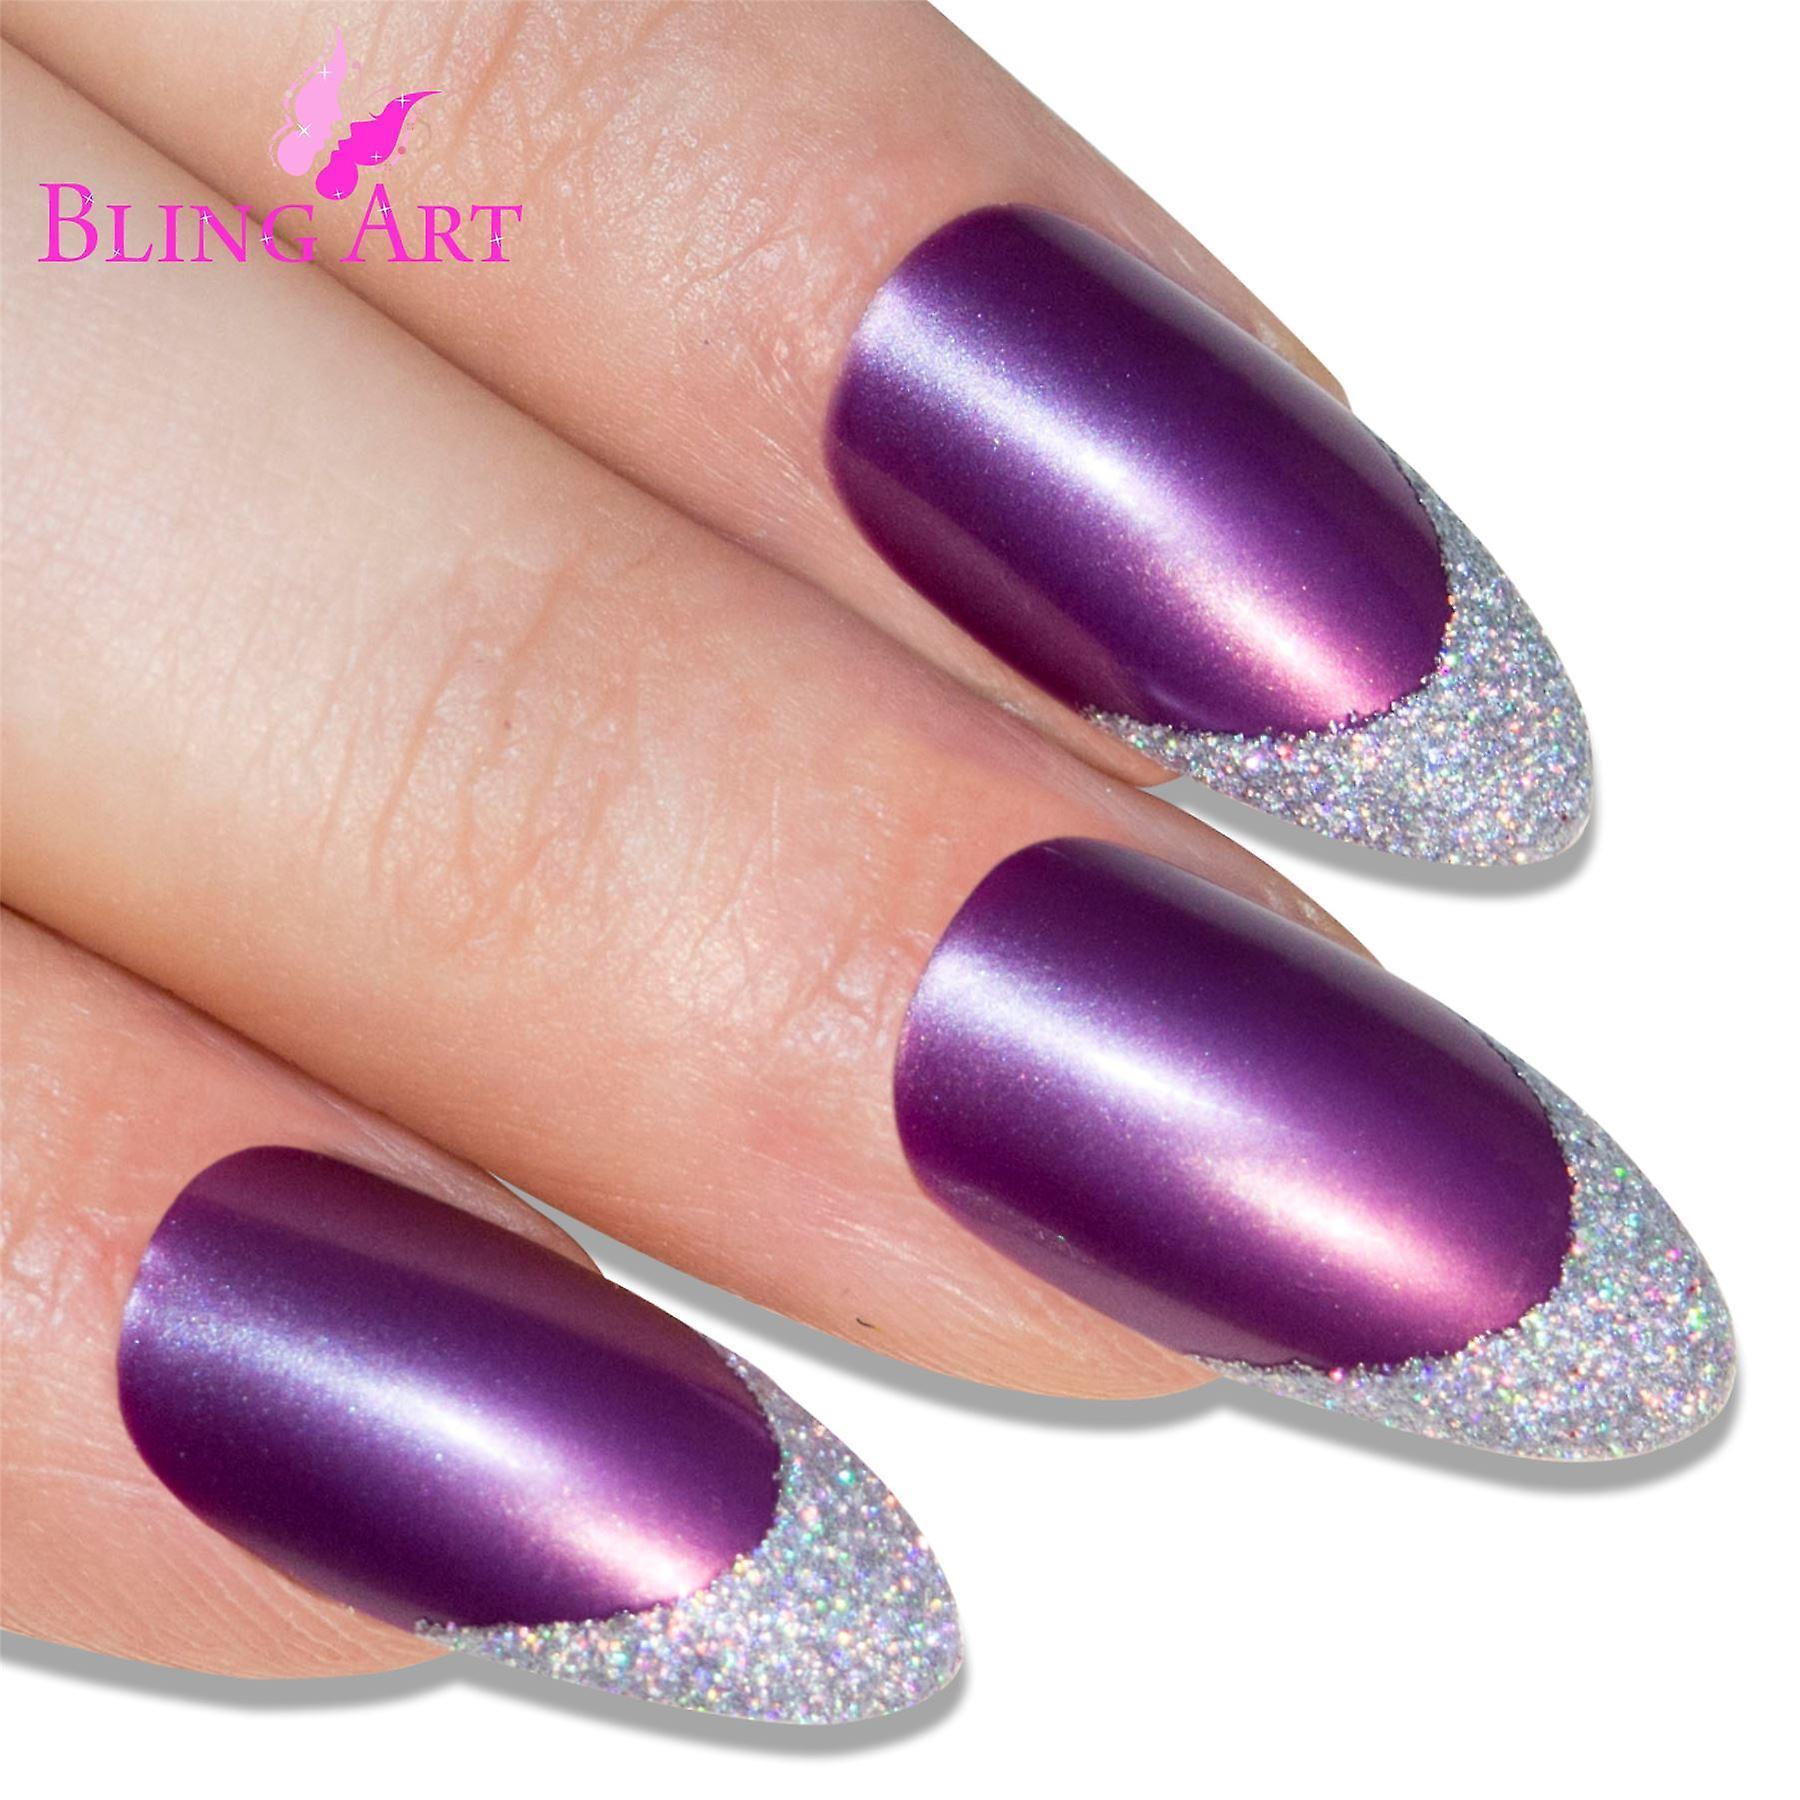 False nails by bling art purple silver almond stiletto long fake acrylic tips glue